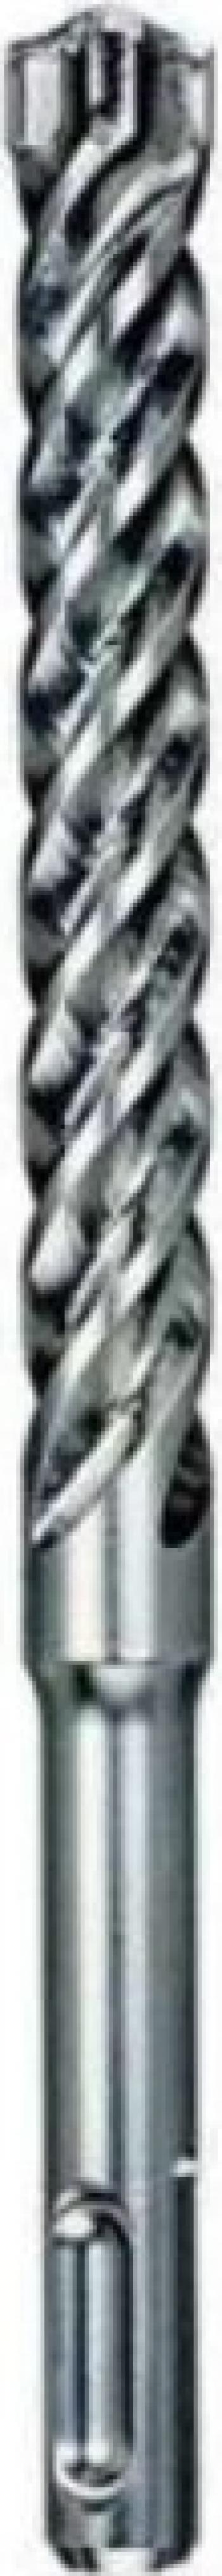 Burghiu zidarie Dewalt XLR SDS-plus 8 x 250 x 310 DT8926-QZ Accesorii masini de gaurit